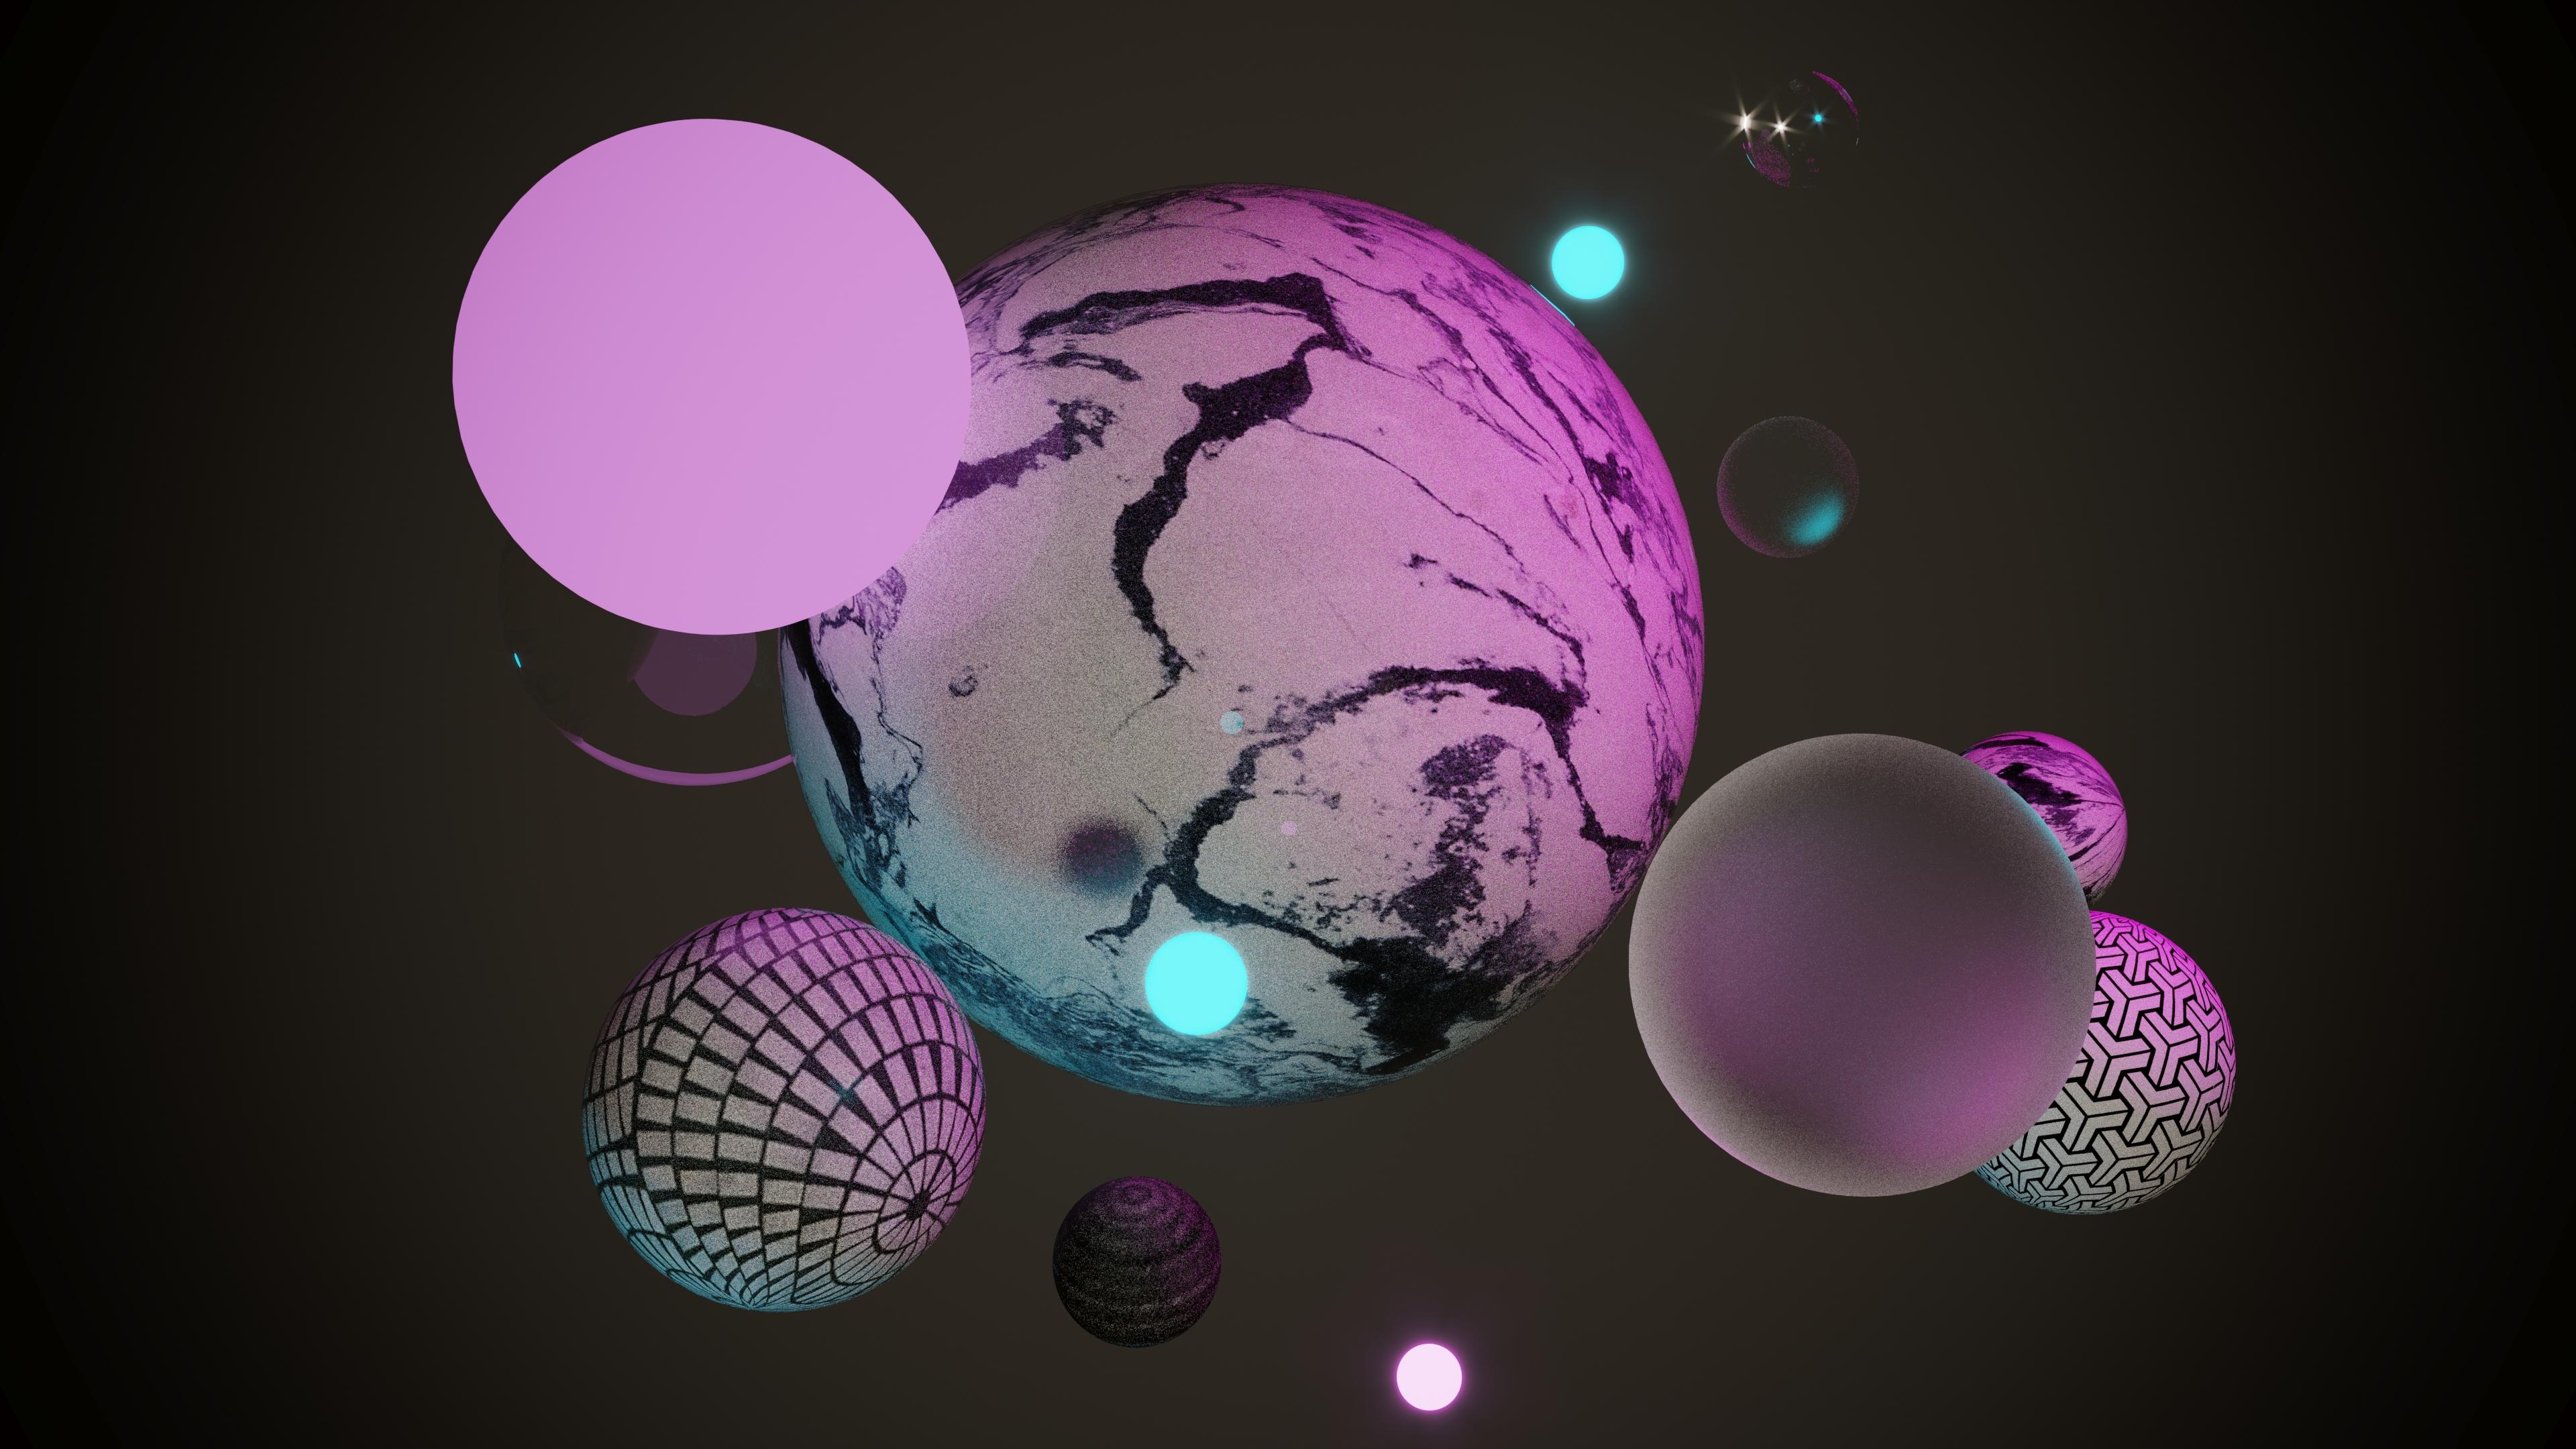 General 3840x2160 4K render minimalism geometric figures 3d design 3D graphics pink cyan magenta ray tracing